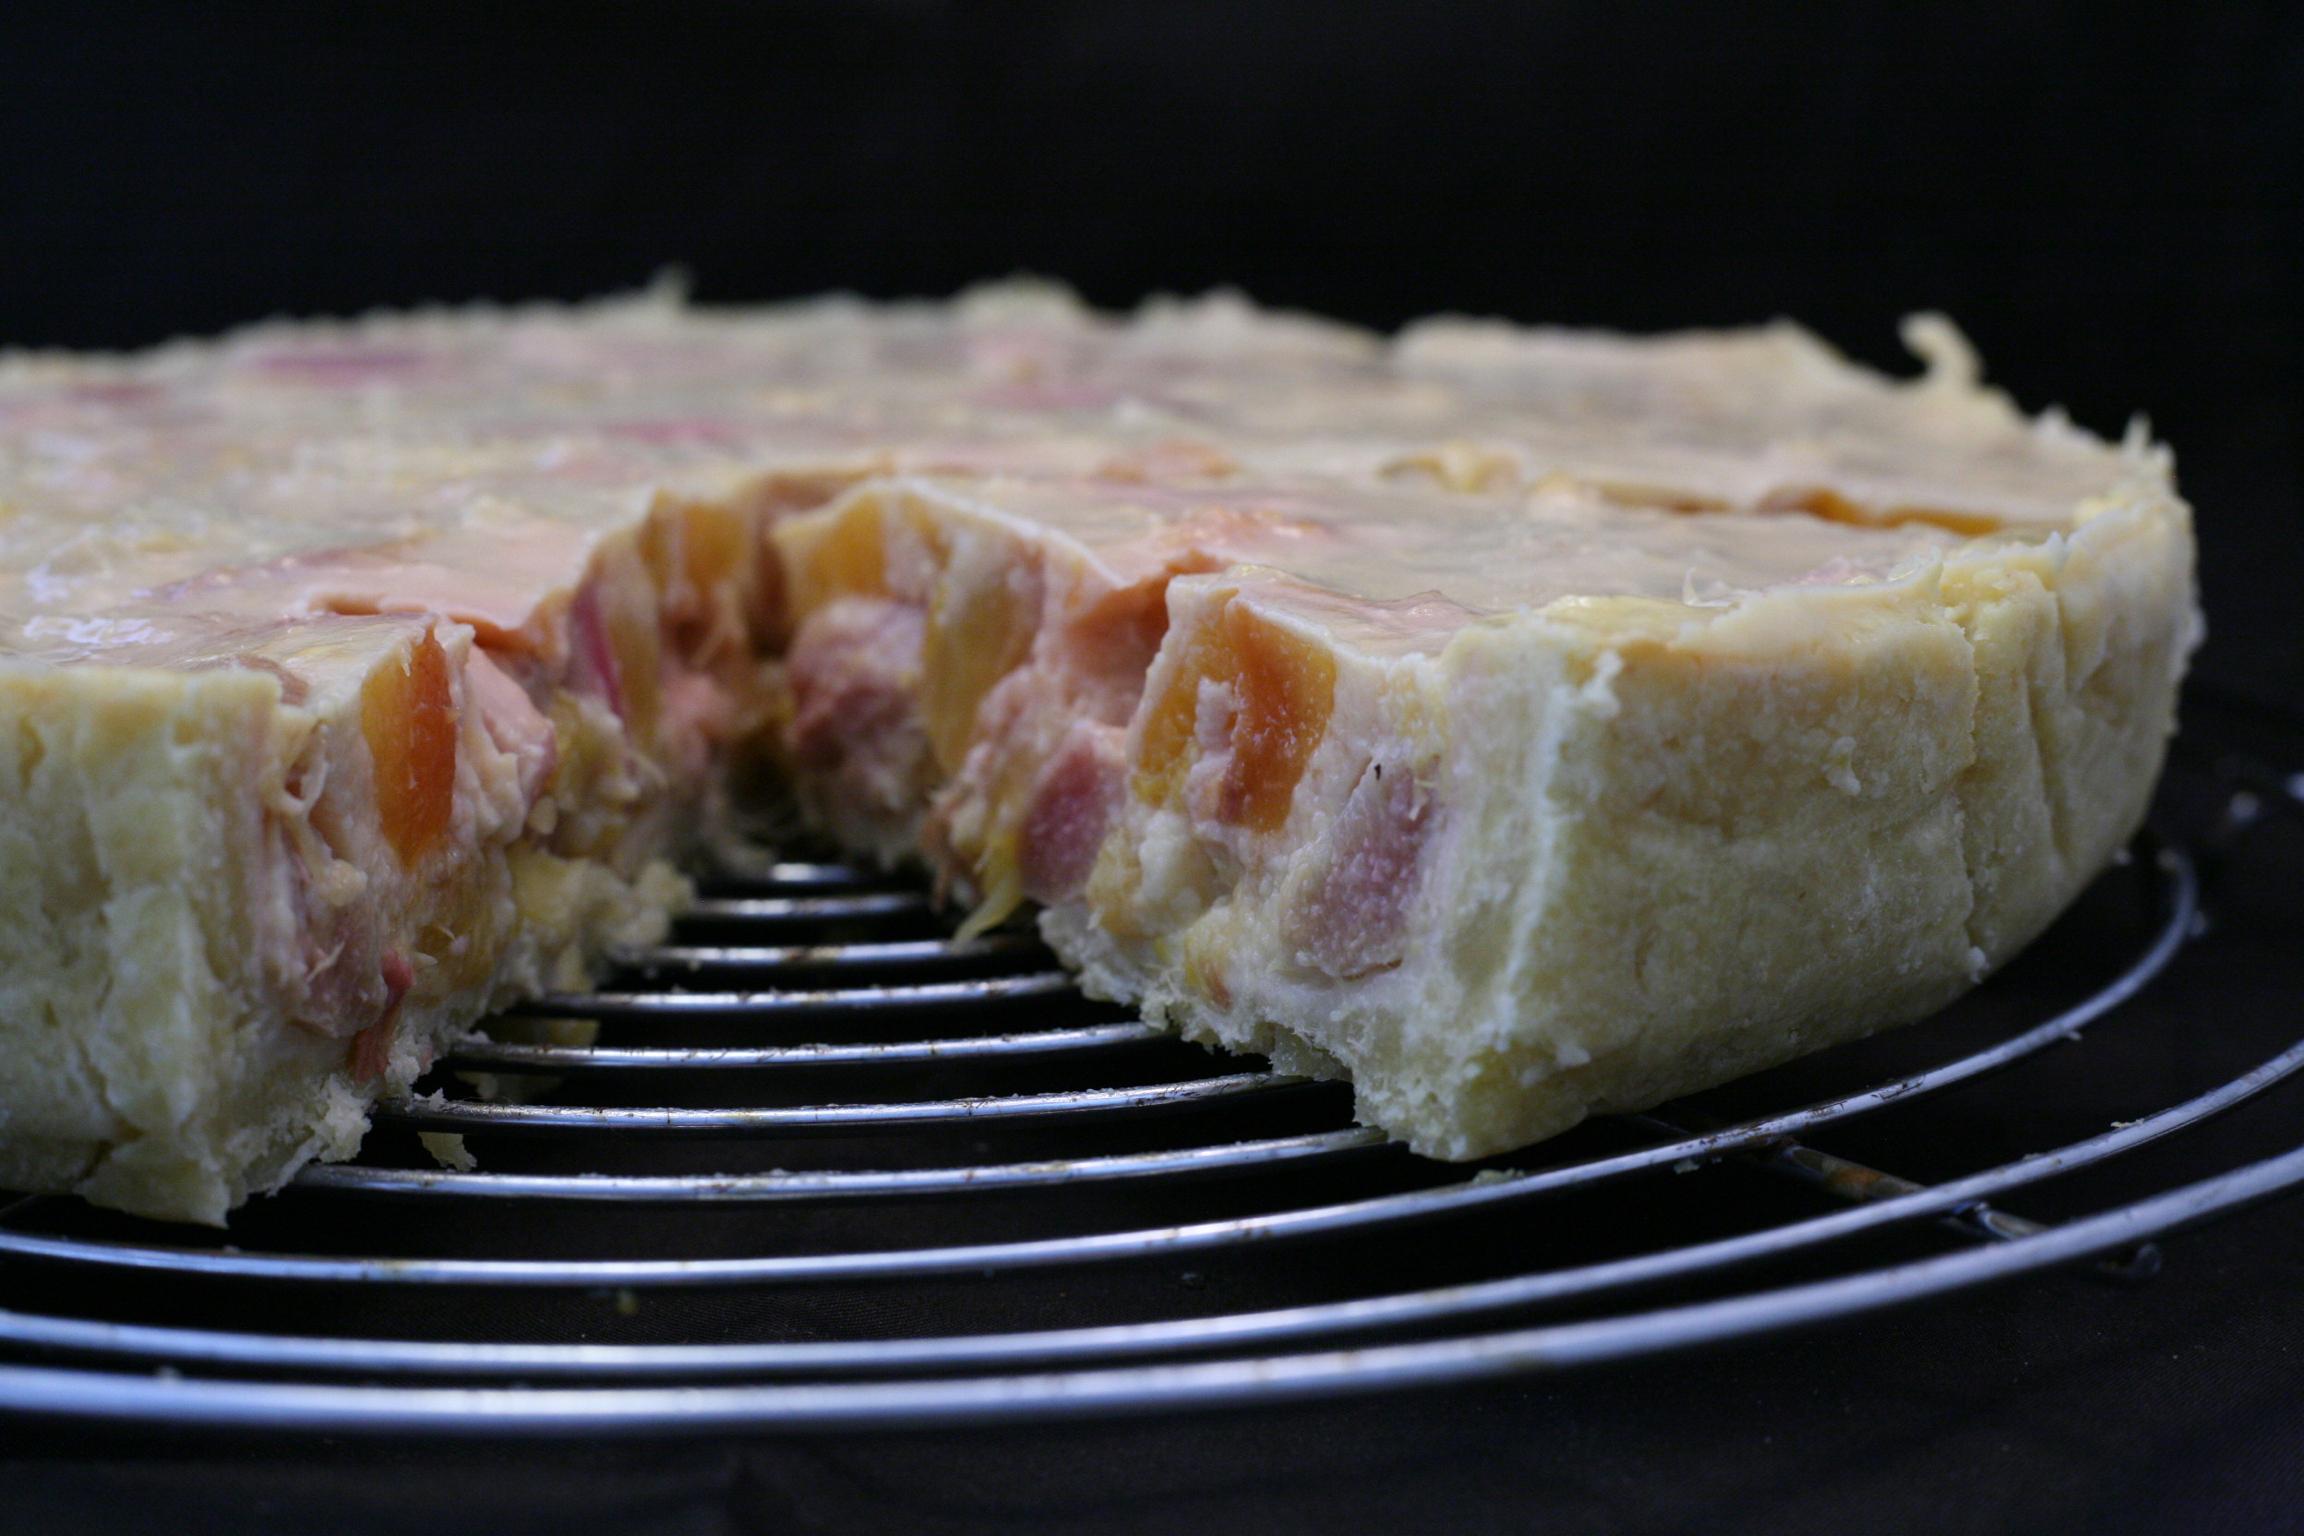 Rhabarber-Pfirsich-Tarte